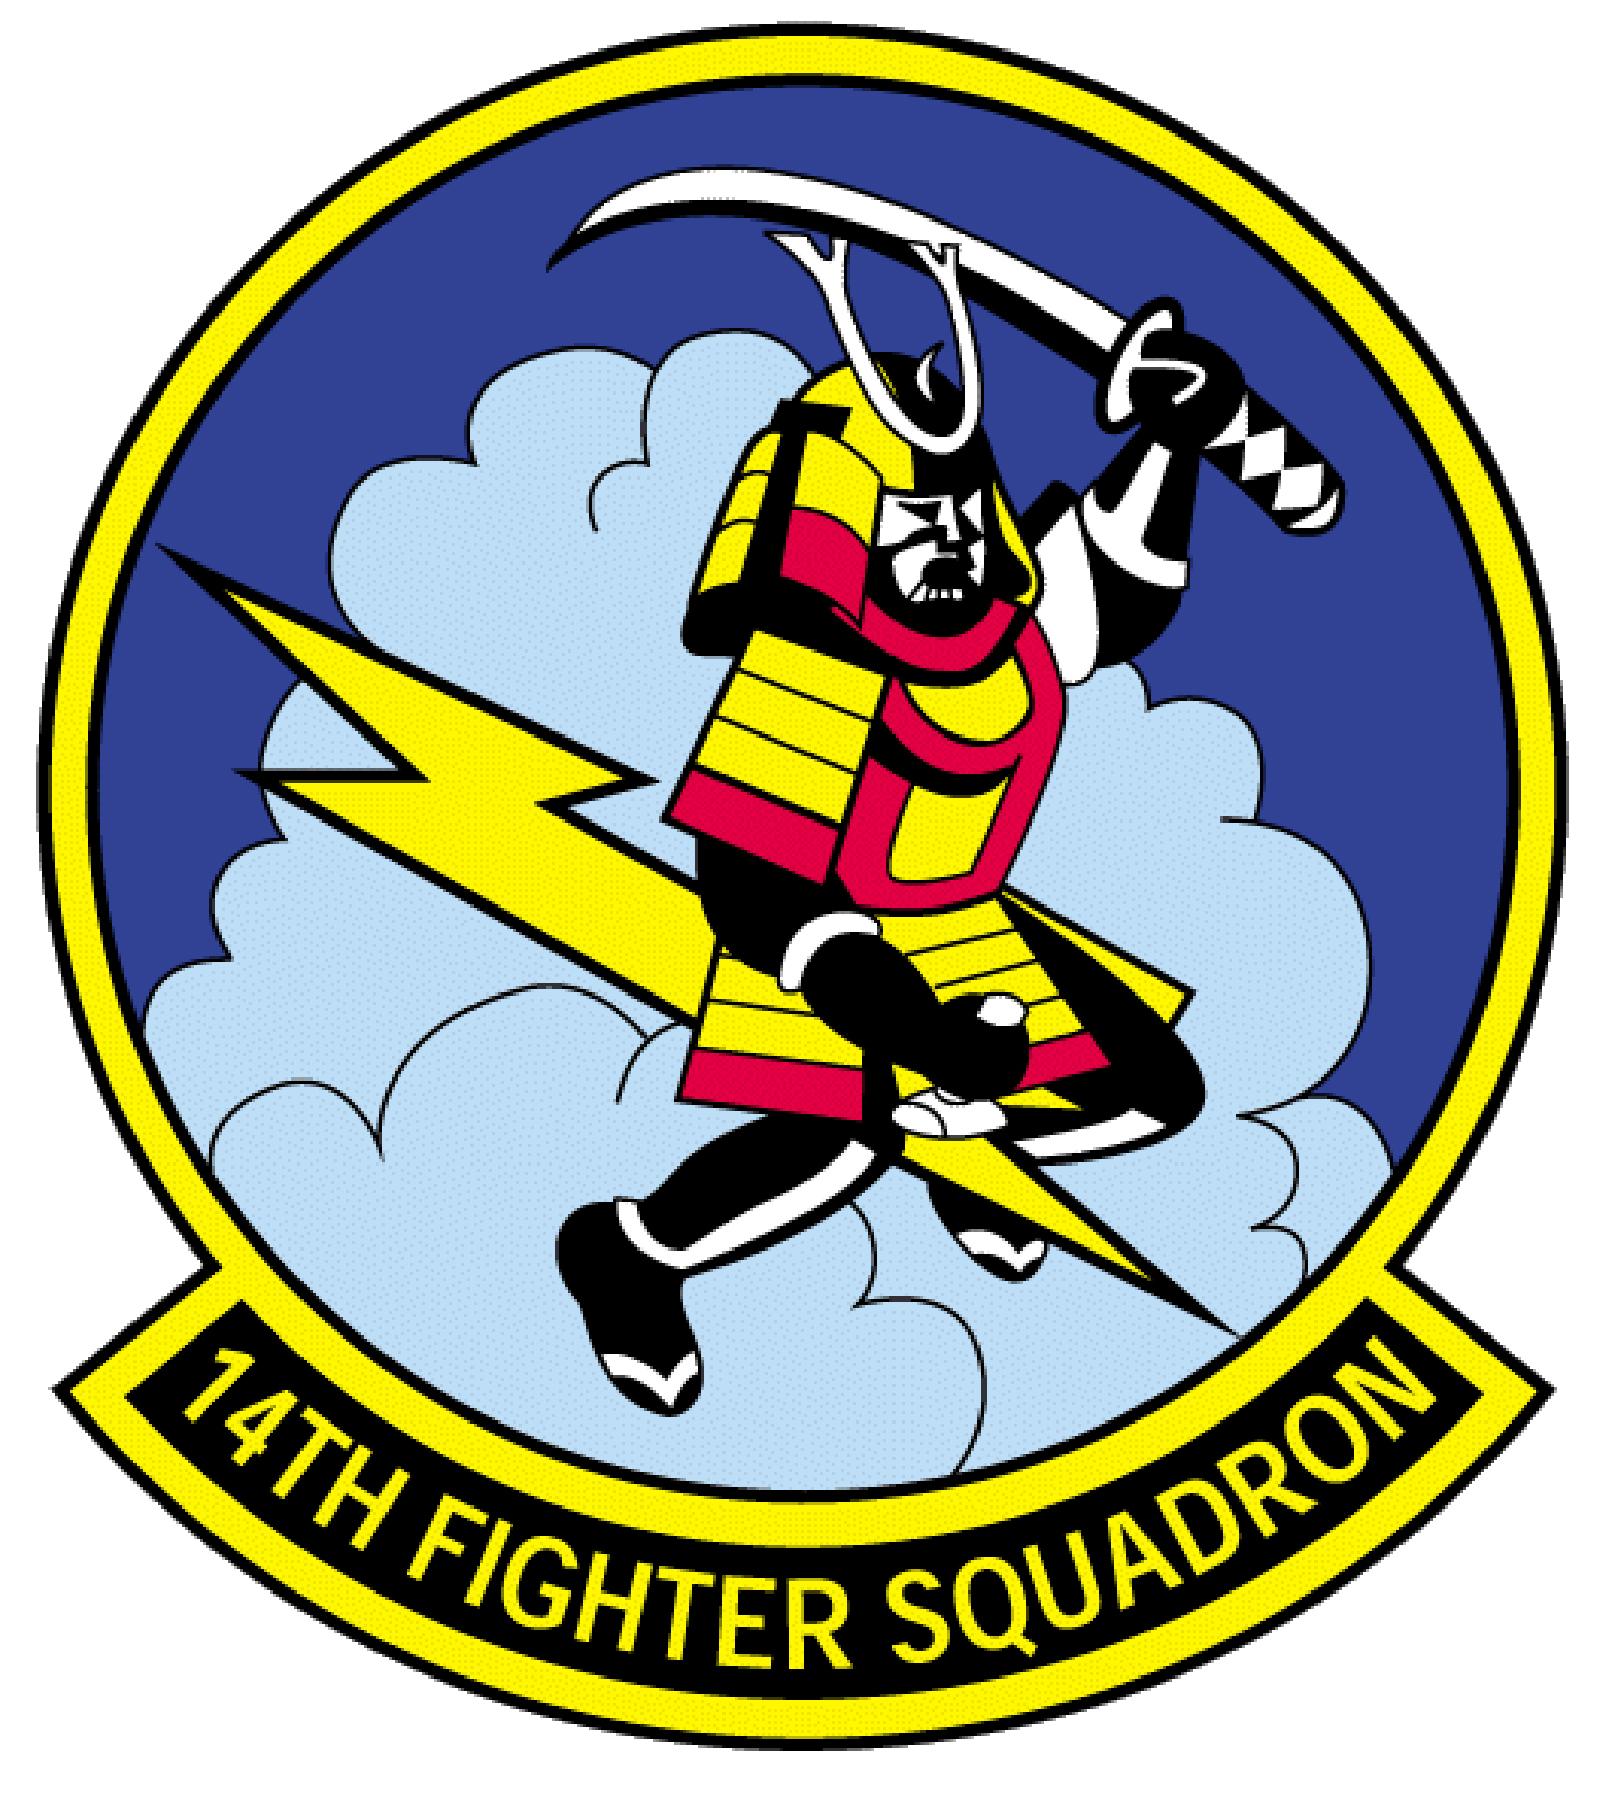 Fighter Squadron Logos File:14th Fighter Squadron.jpg